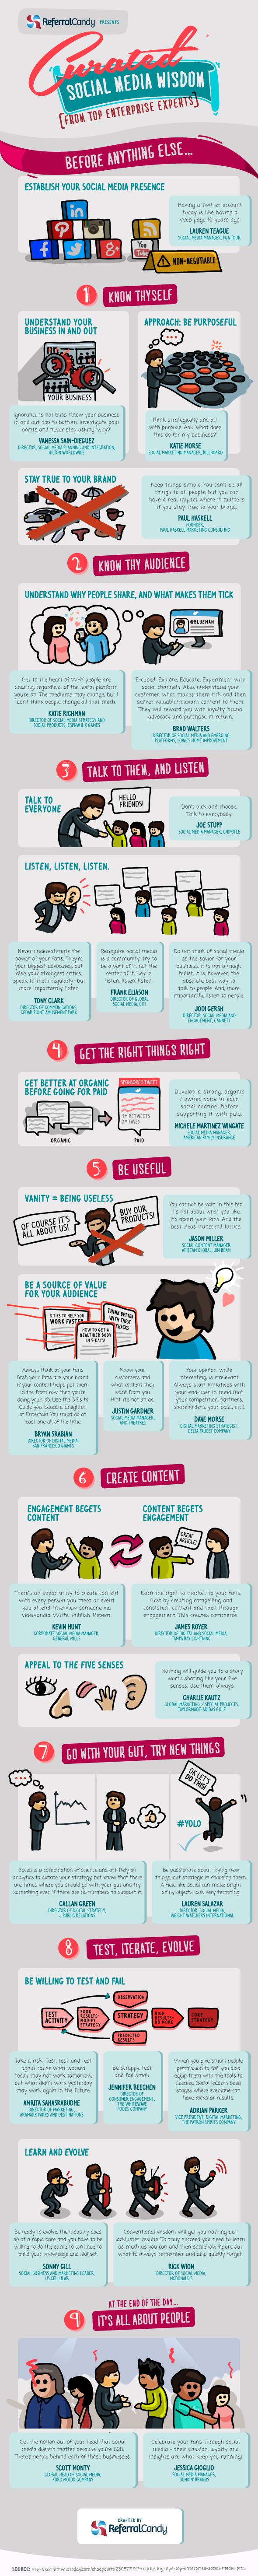 social-marketing-wisdom